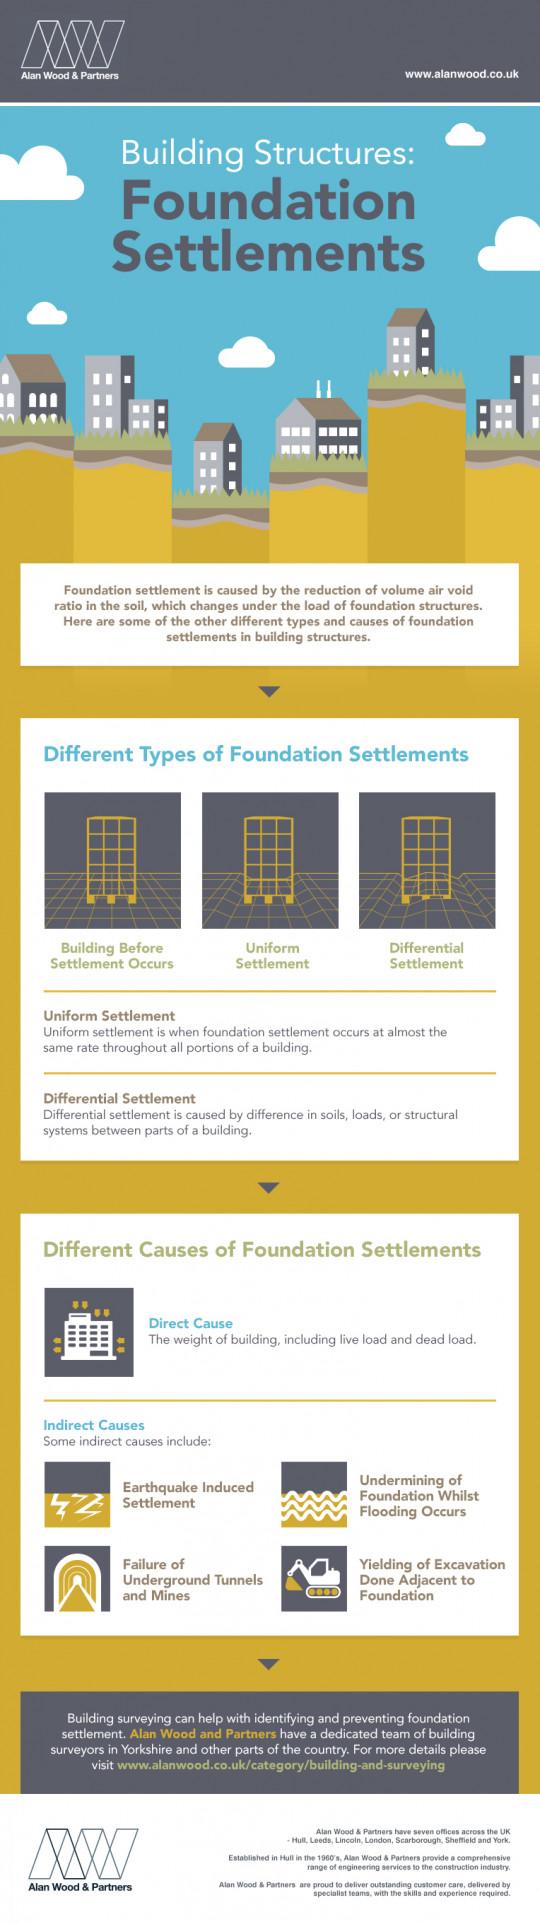 Building Structures: Foundation Settlements